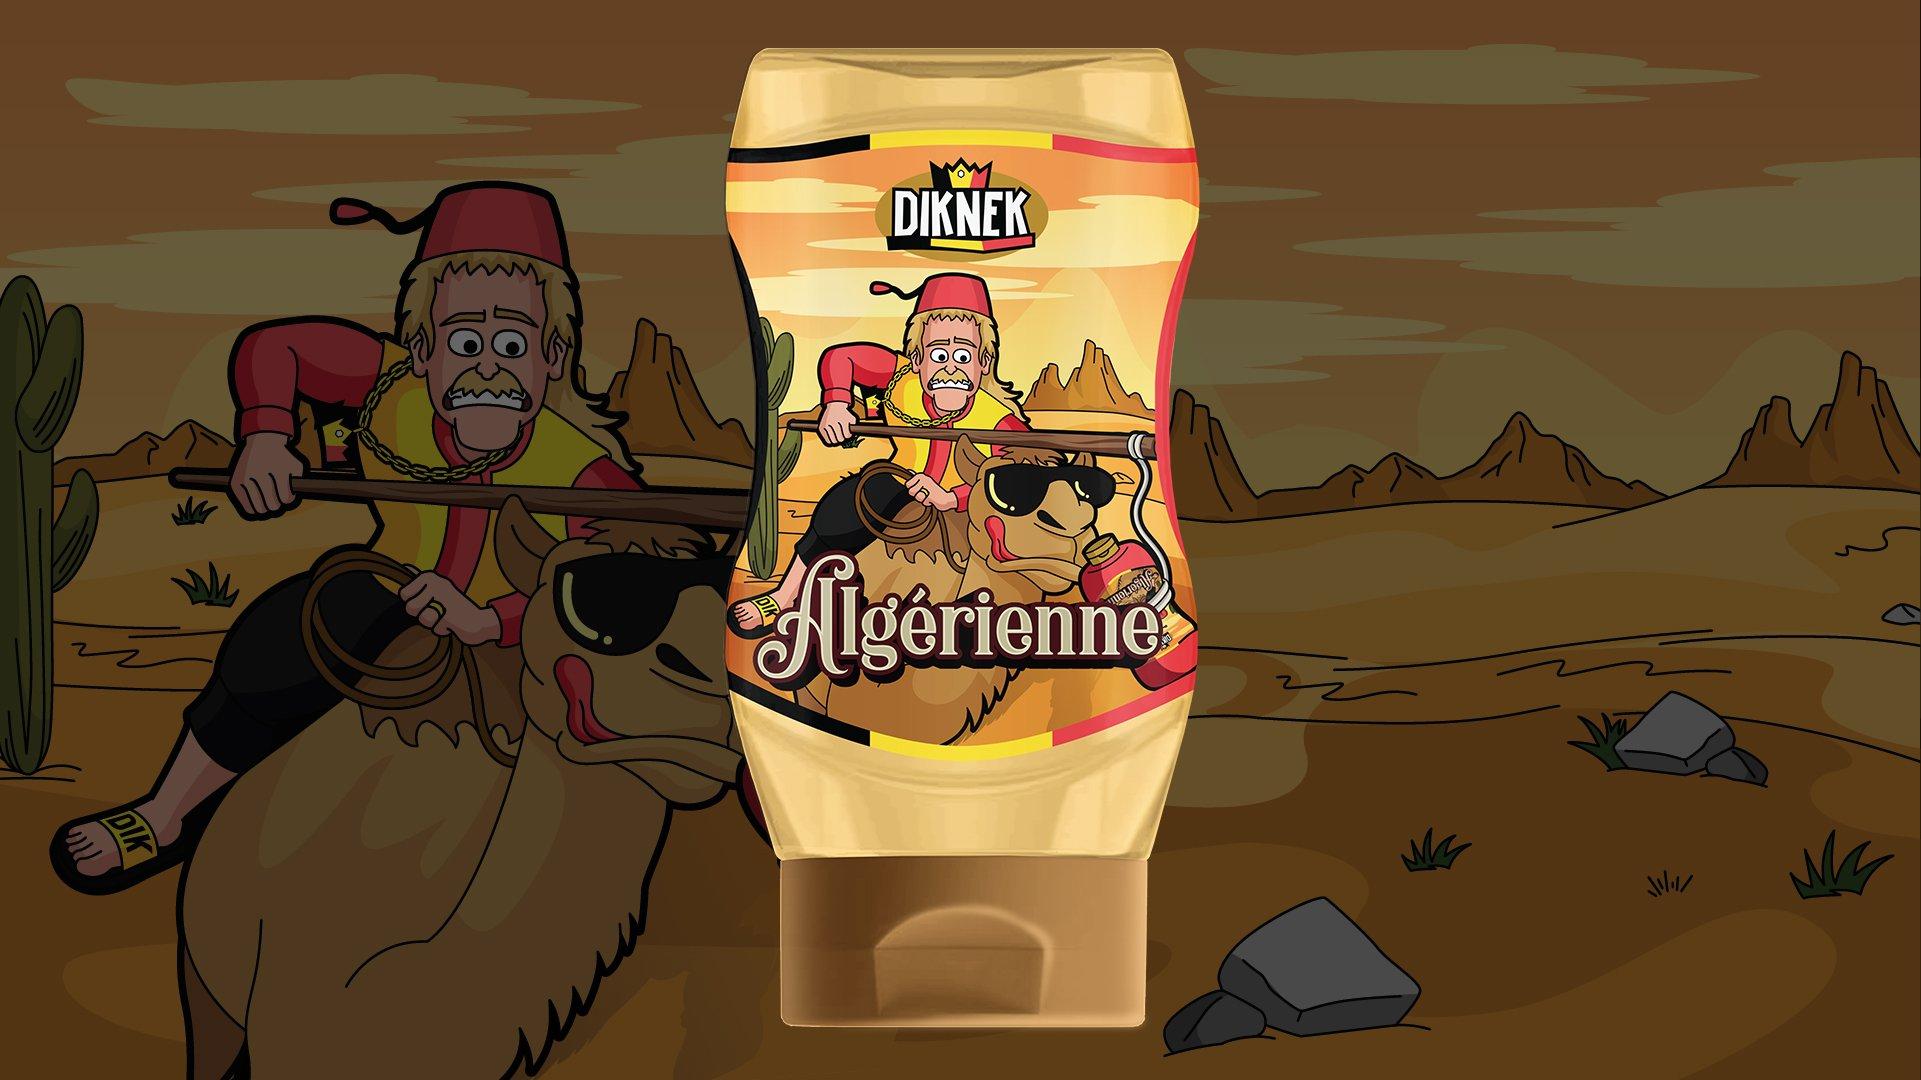 DIKNEK Sauce Label Design